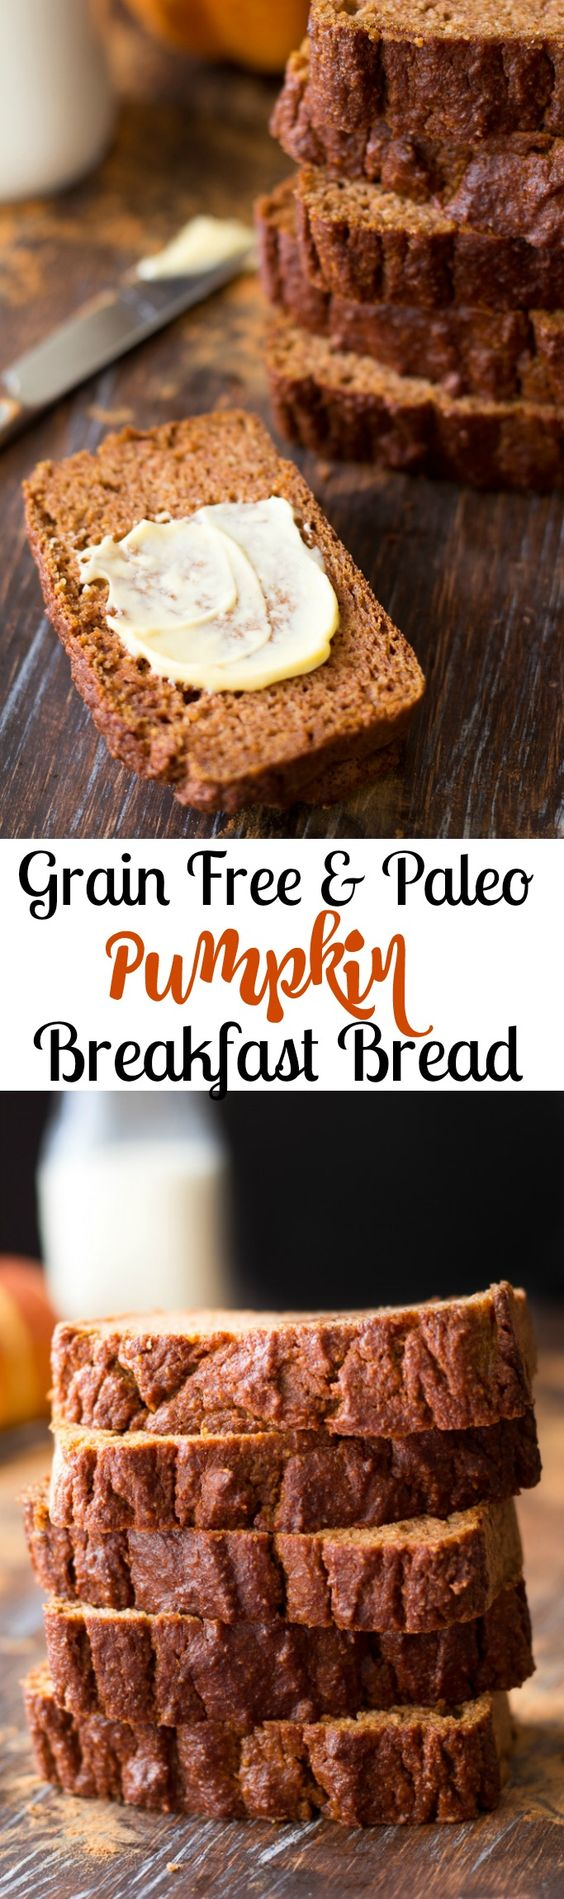 simple grain free and paleo pumpkin bread great for breakfast! Gluten free, grain free, dairy free tender yet hearty and healthy Paleo pumpkin bread loaded with sweet pumpkin spice!